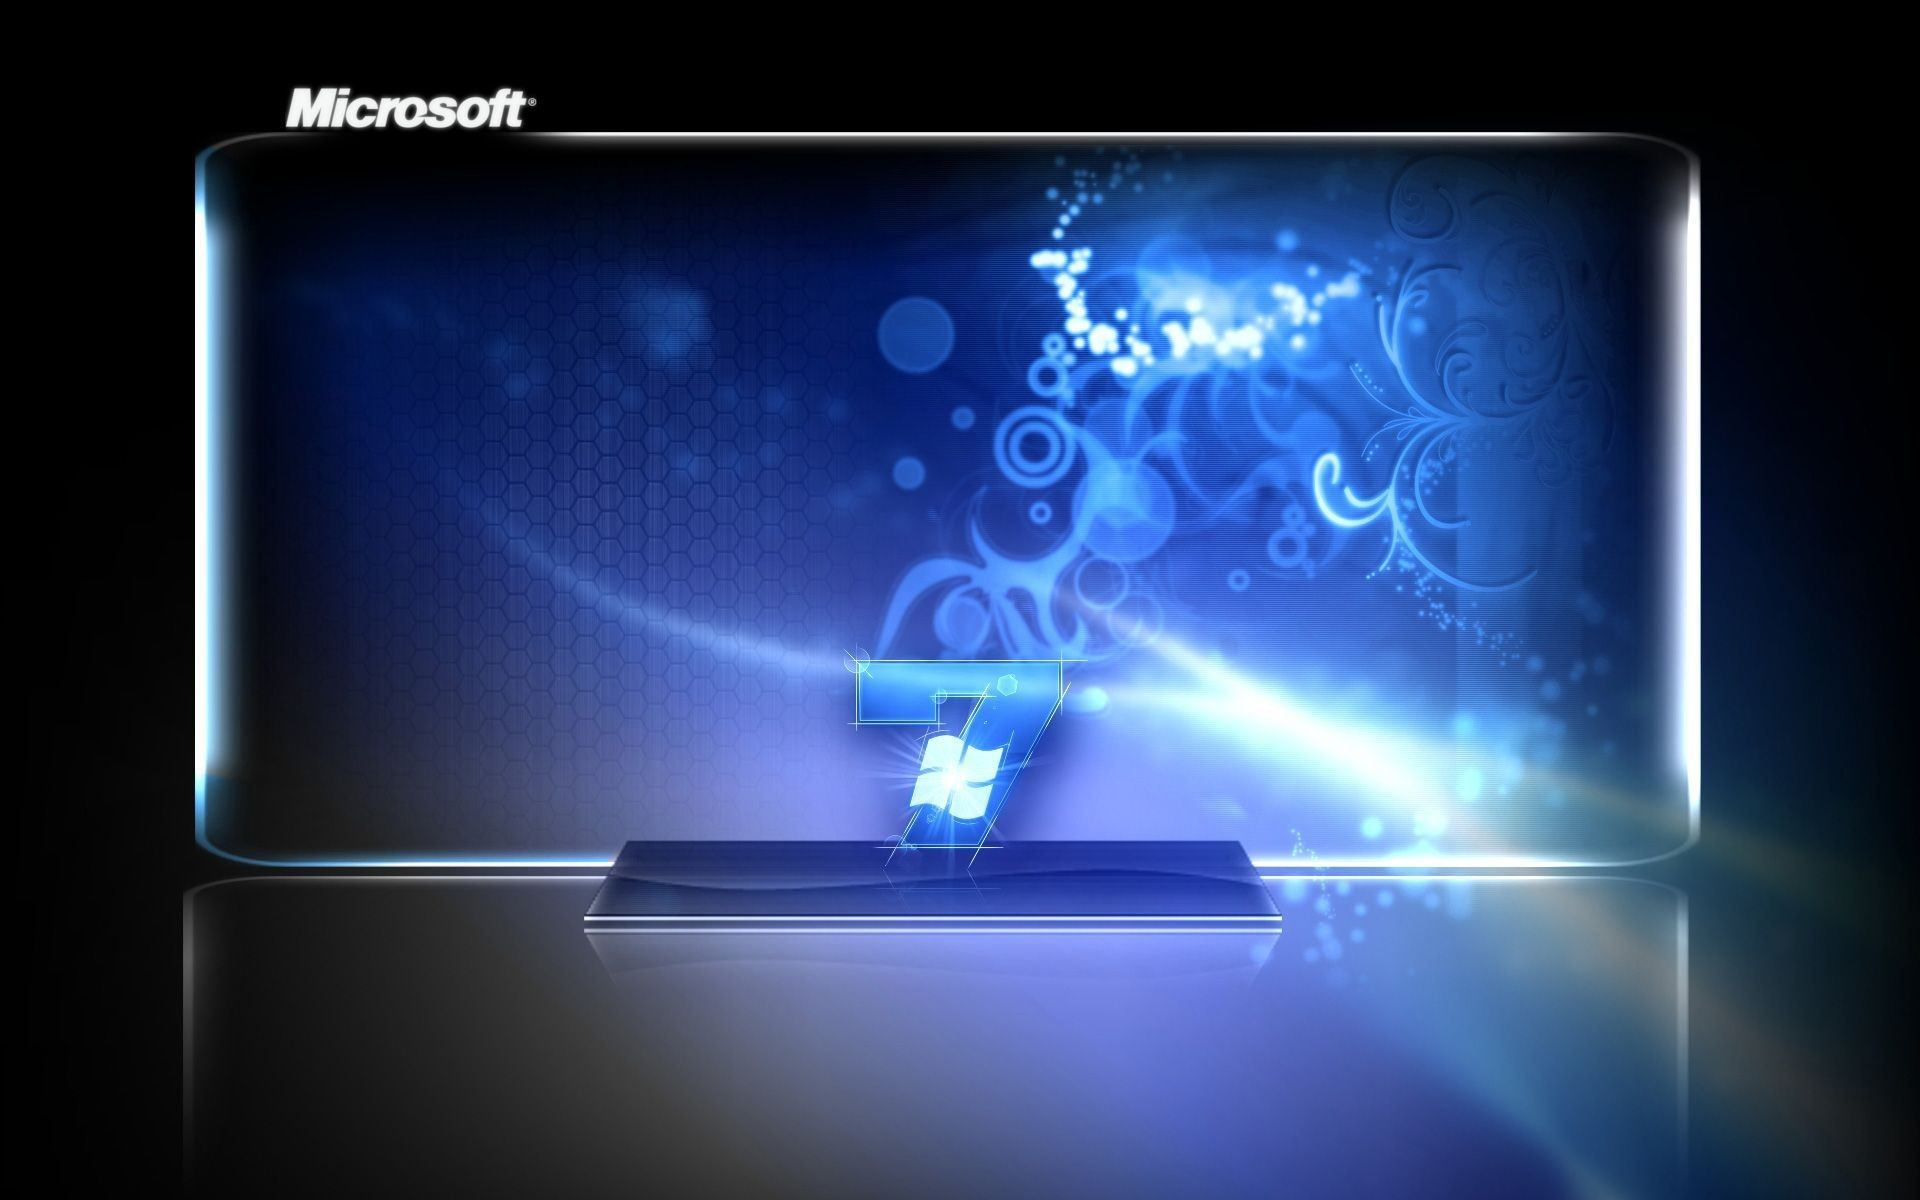 Laptop x HiTech Wallpapers Desktop Backgrounds HD 1920×1200